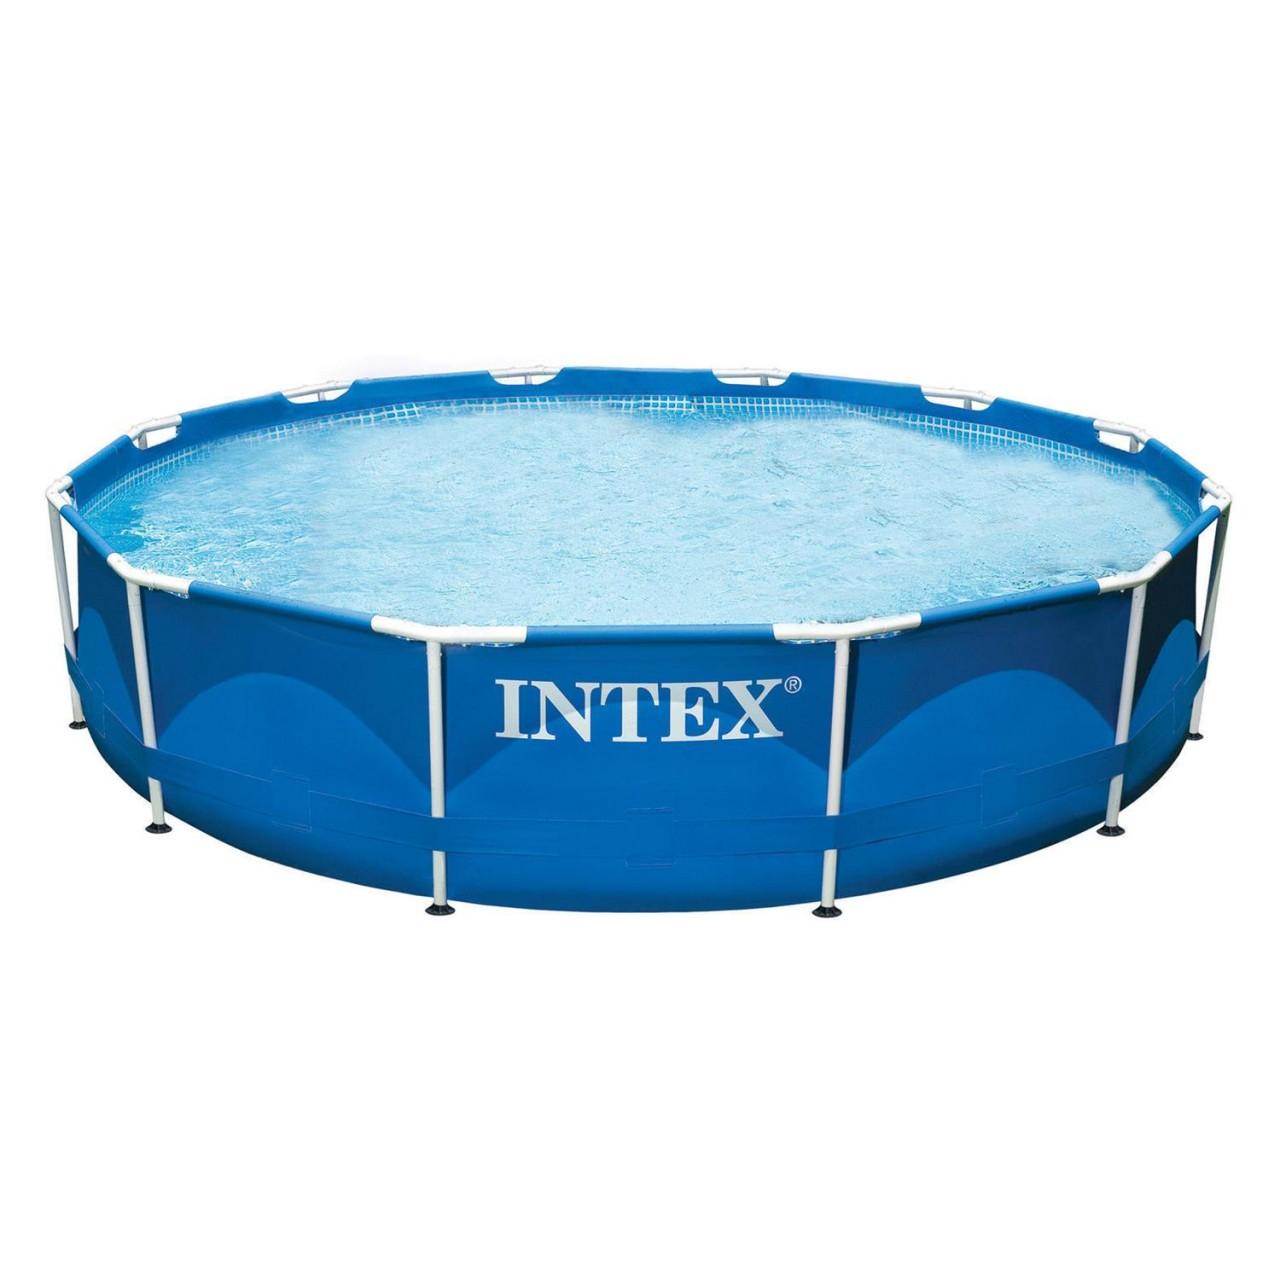 Intex 28210 Swimming Pool Metal Frame 366x76 cm Stahlrohrbecken Schwimmbecken